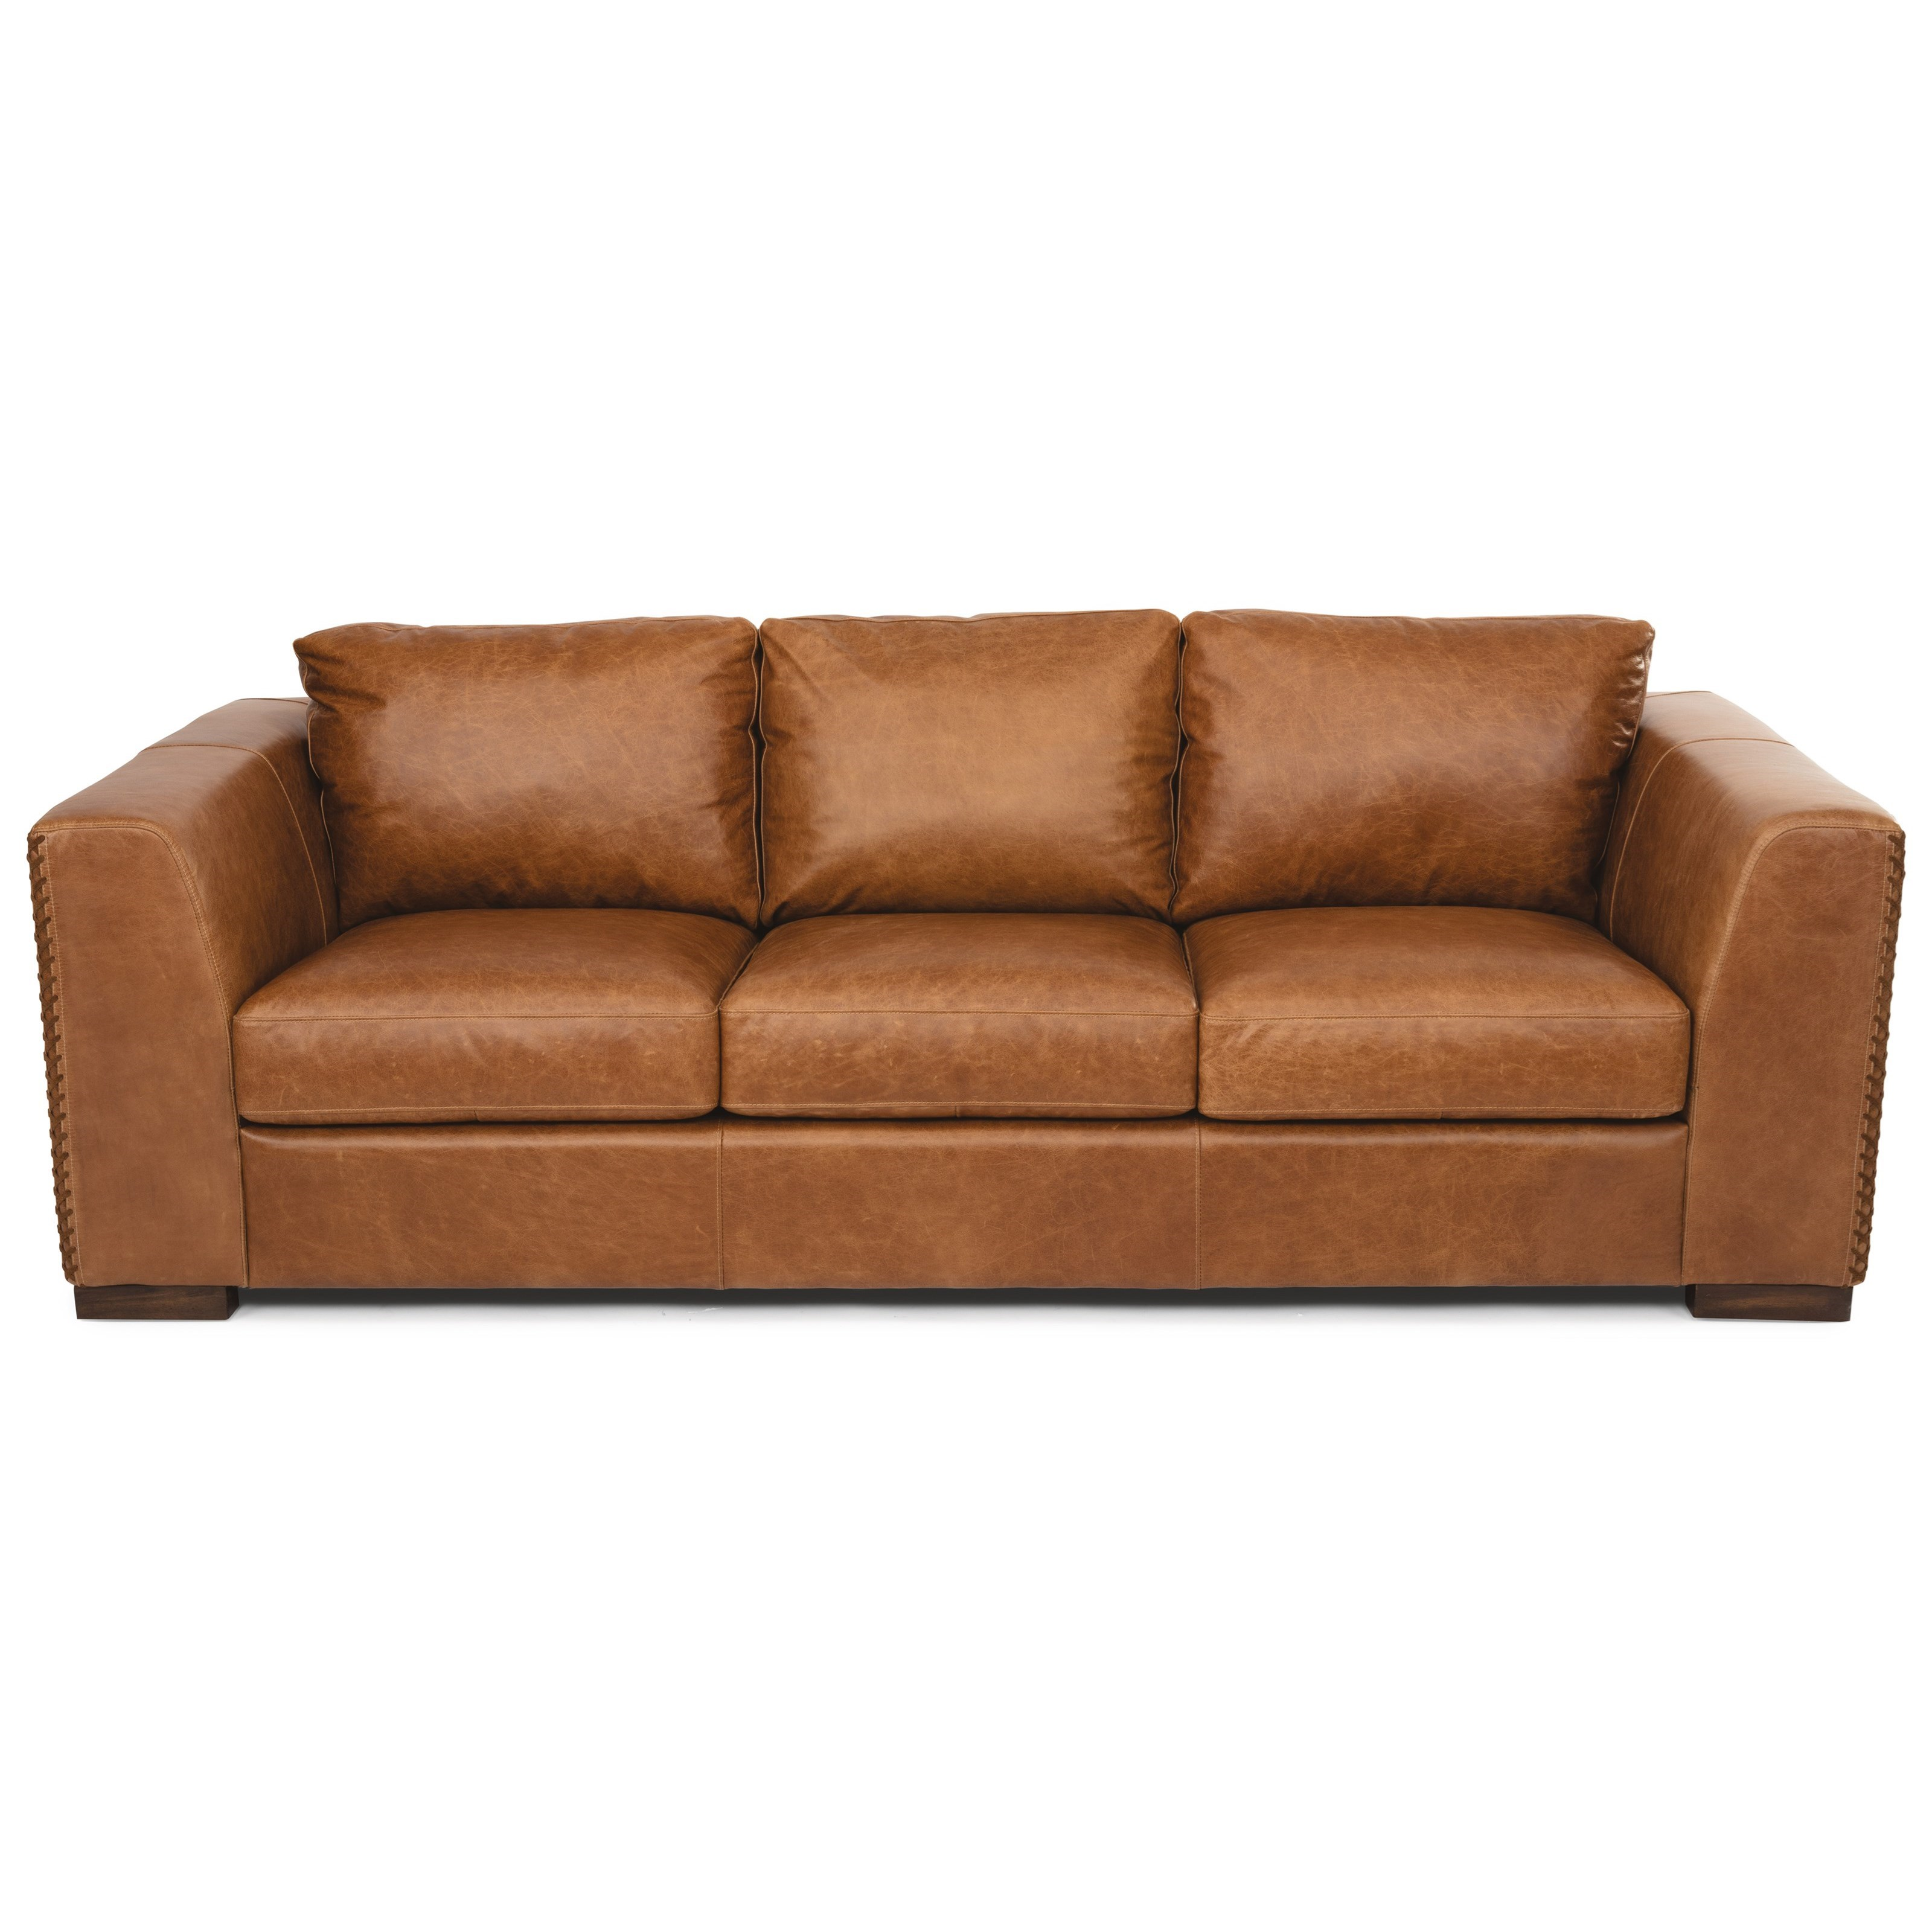 Latitudes - Hawkins Sofa  by Flexsteel at Walker's Furniture